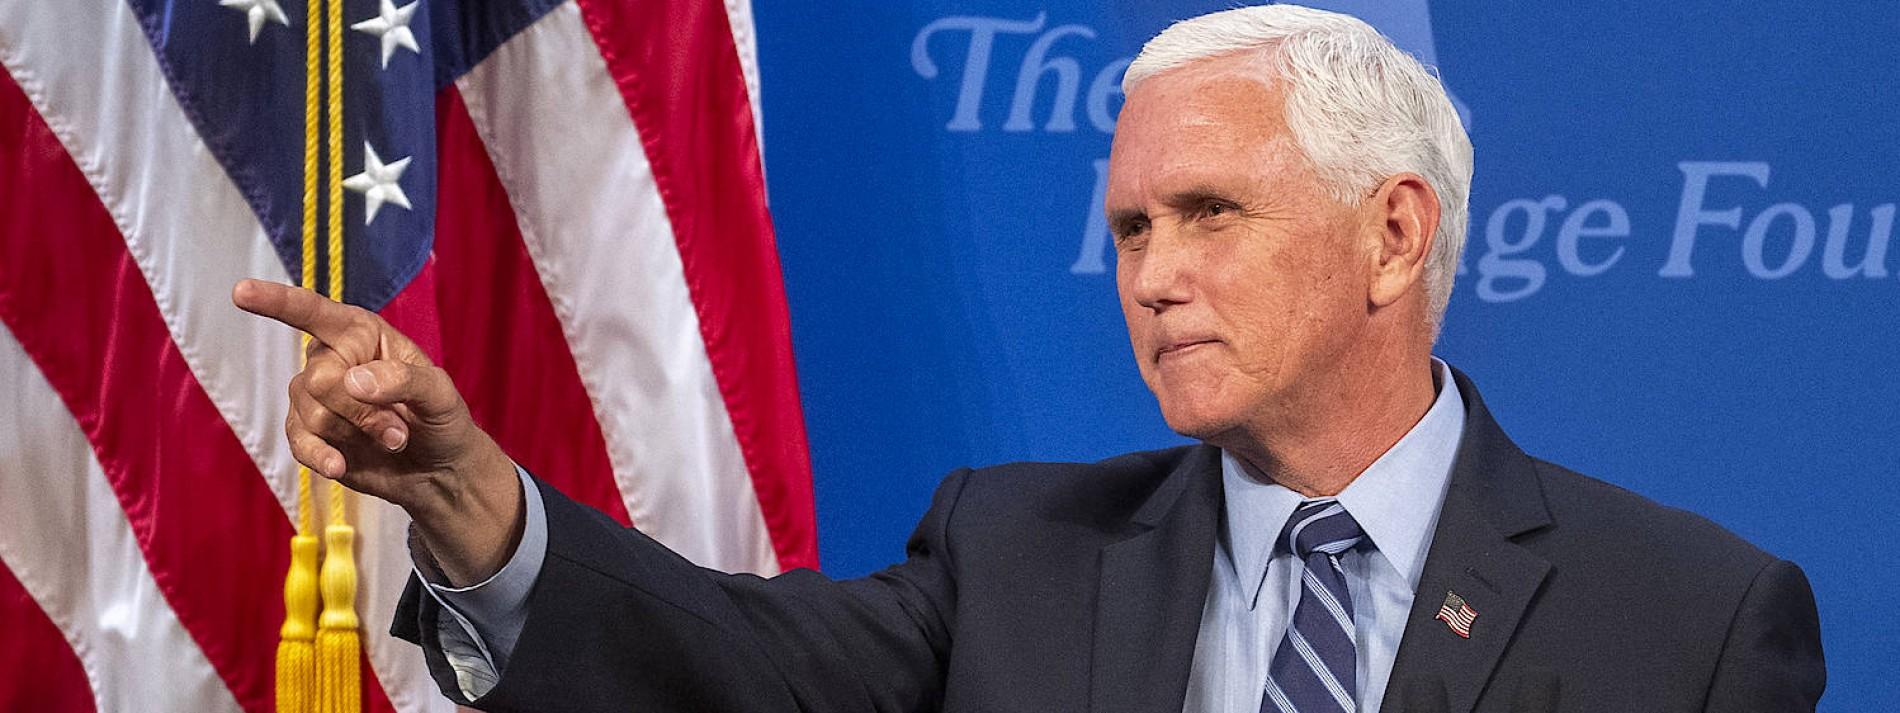 Will Mike Pence Präsident werden?